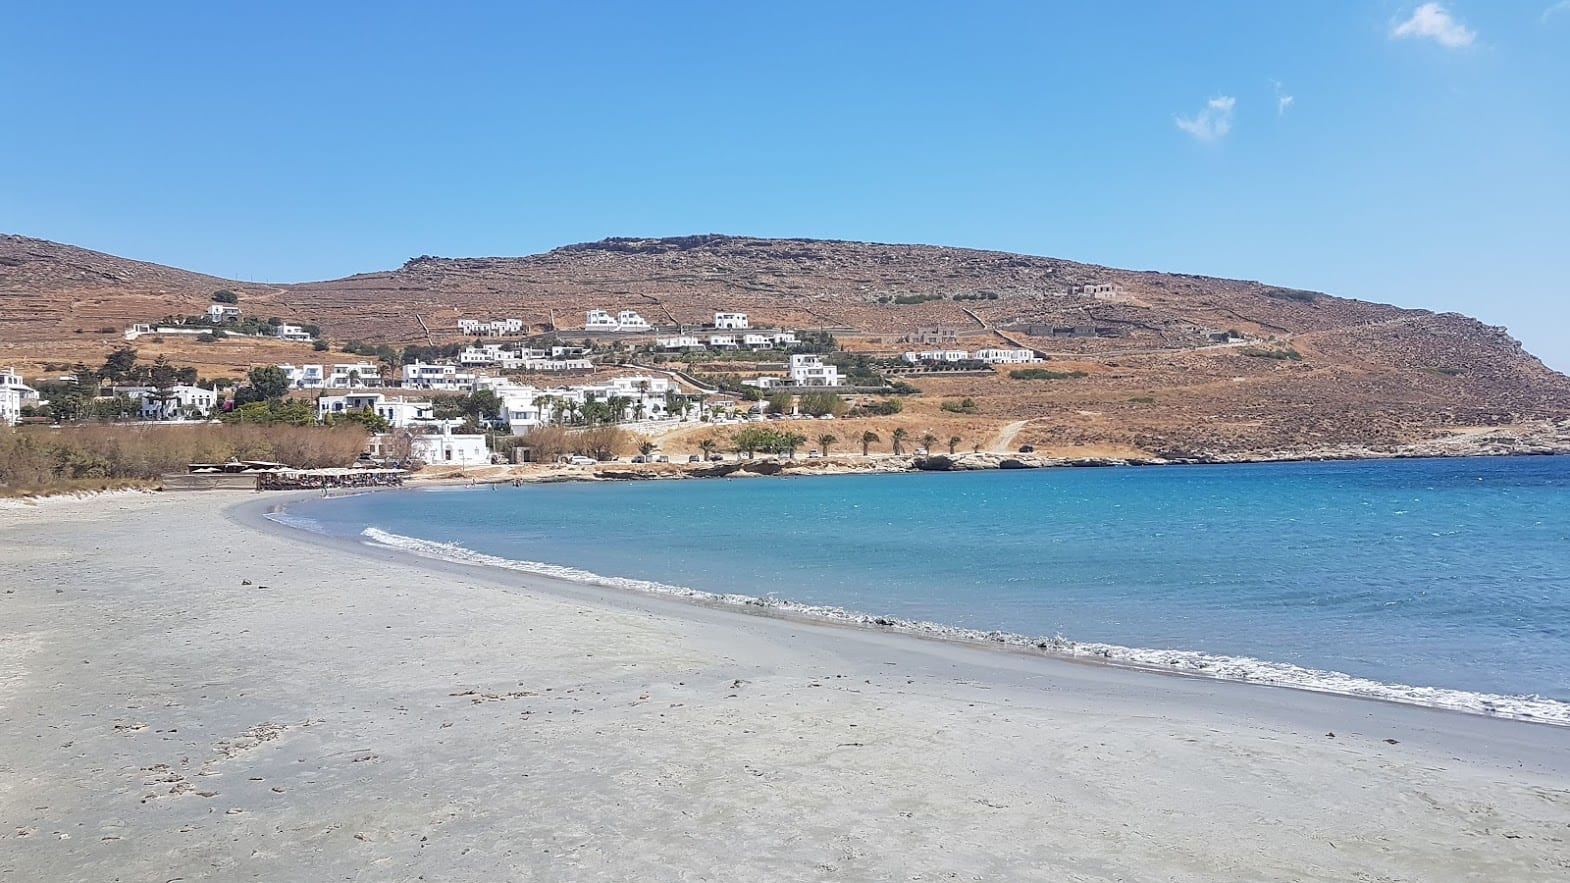 The beach at Agios Ioannis Porto in Tinos Island Greece